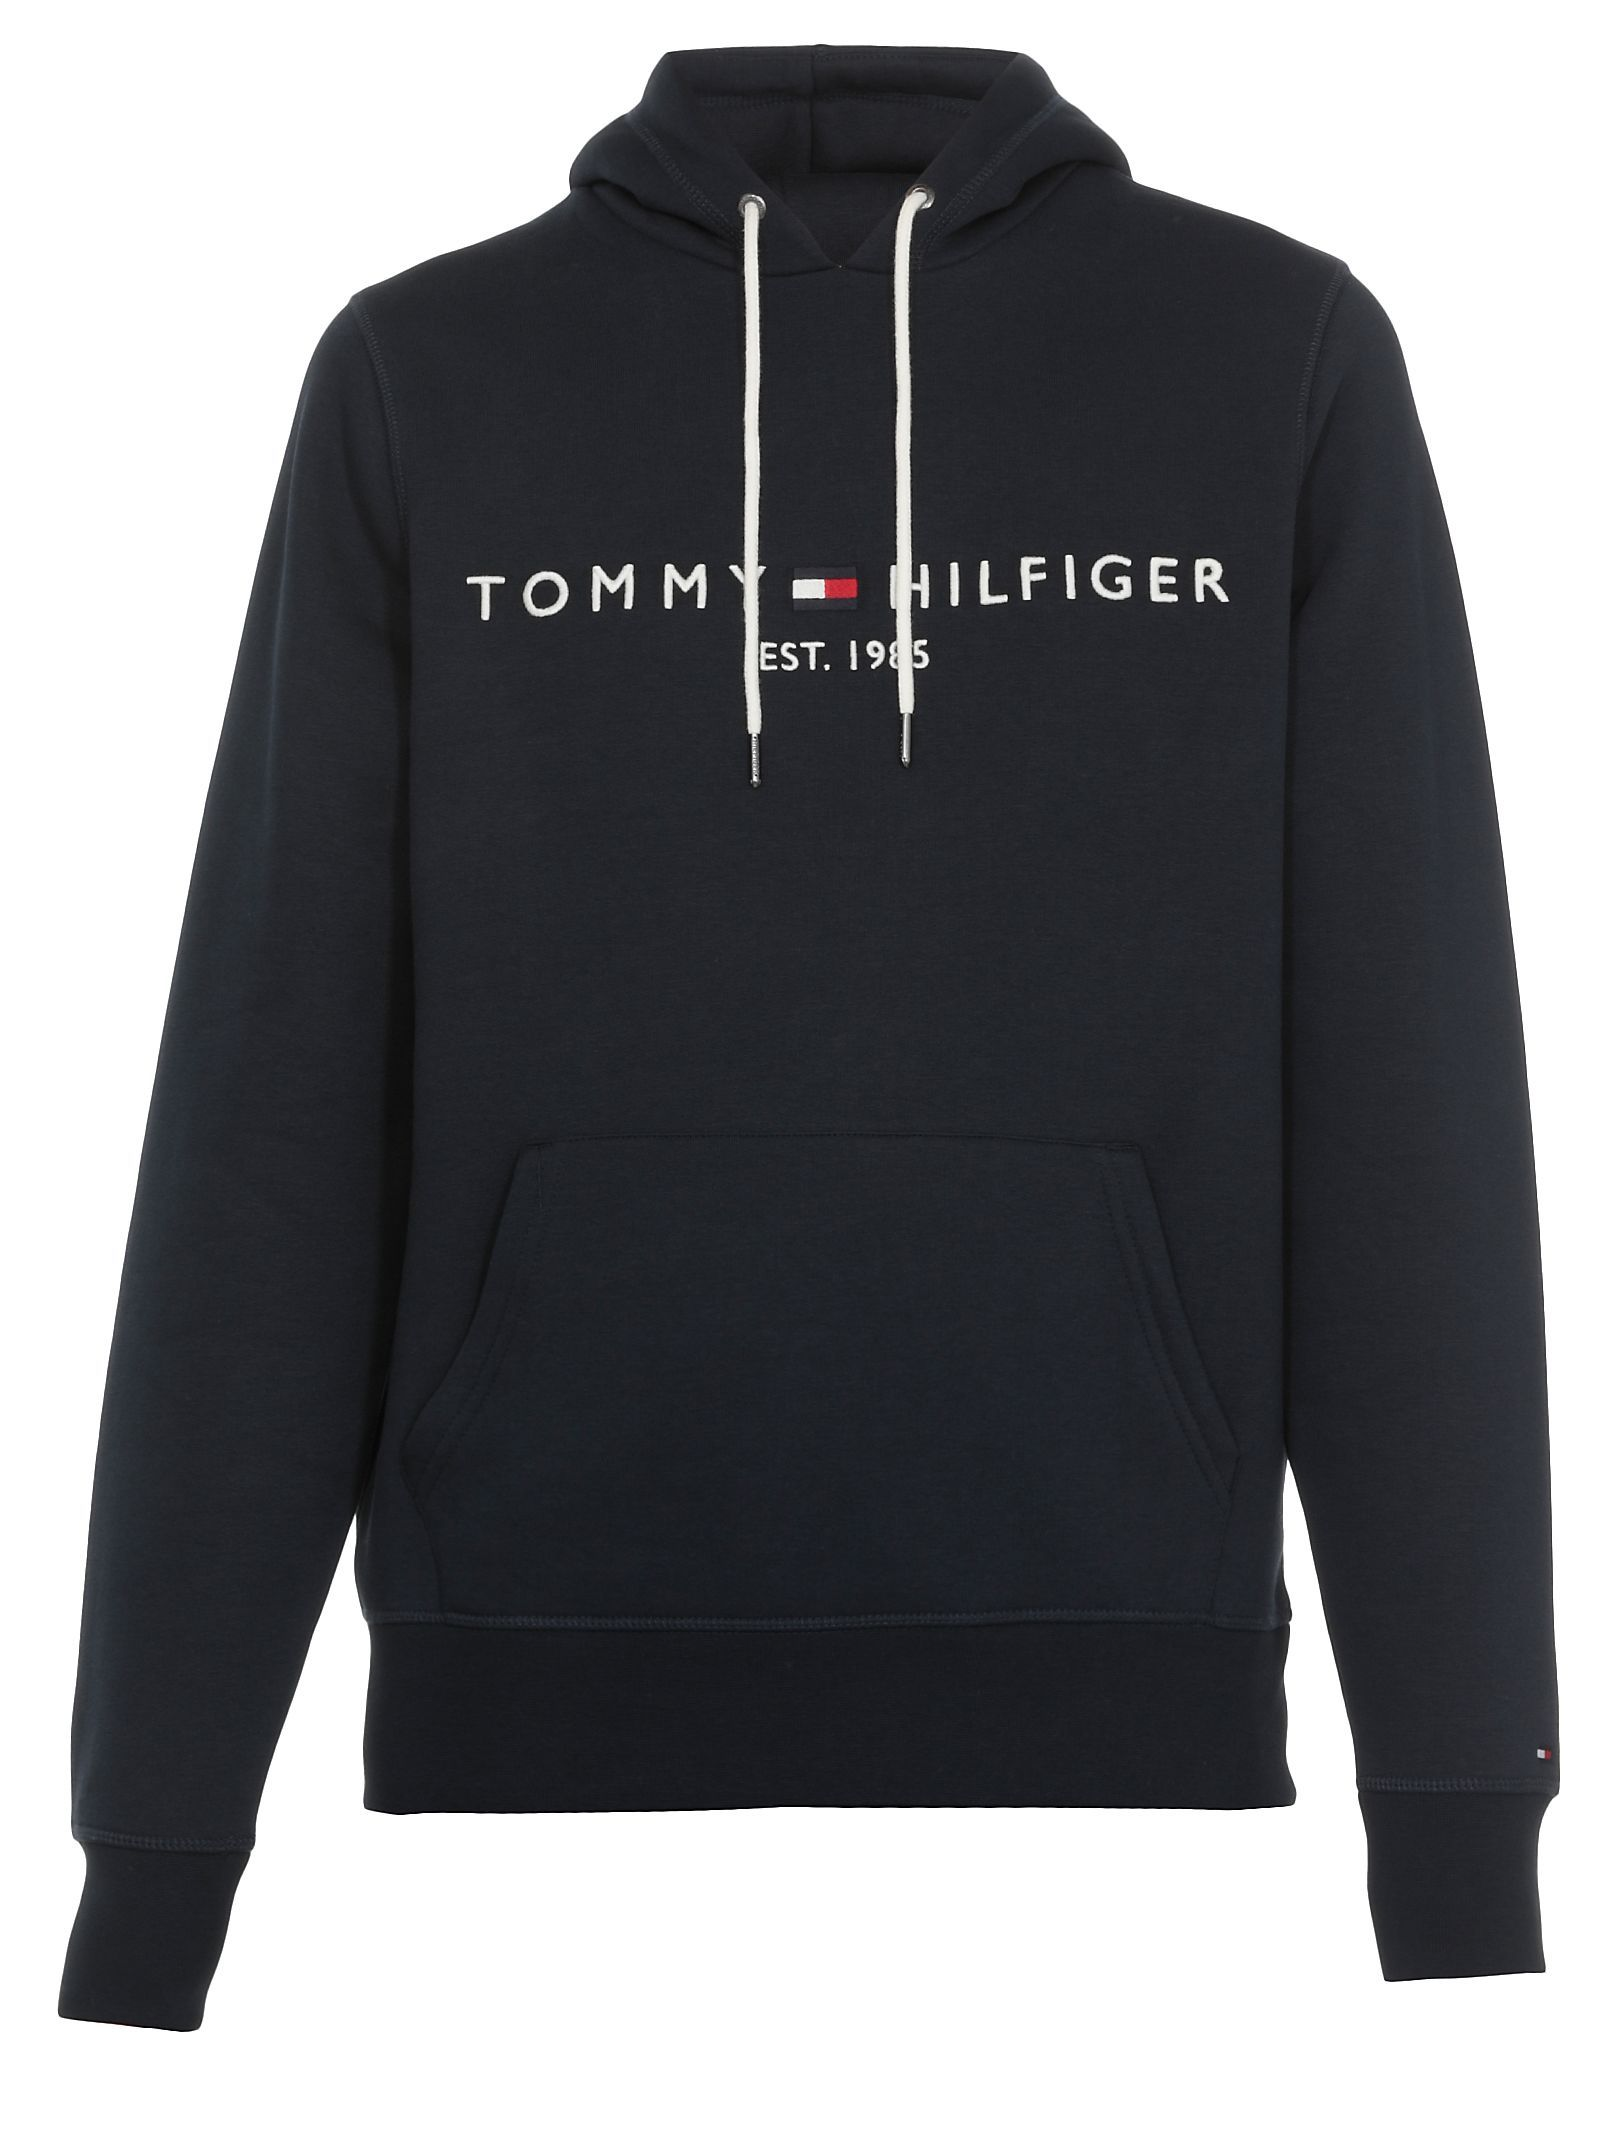 TOMMY HILFIGER COTTON SWEATSHIRT. #tommyhilfiger #cloth